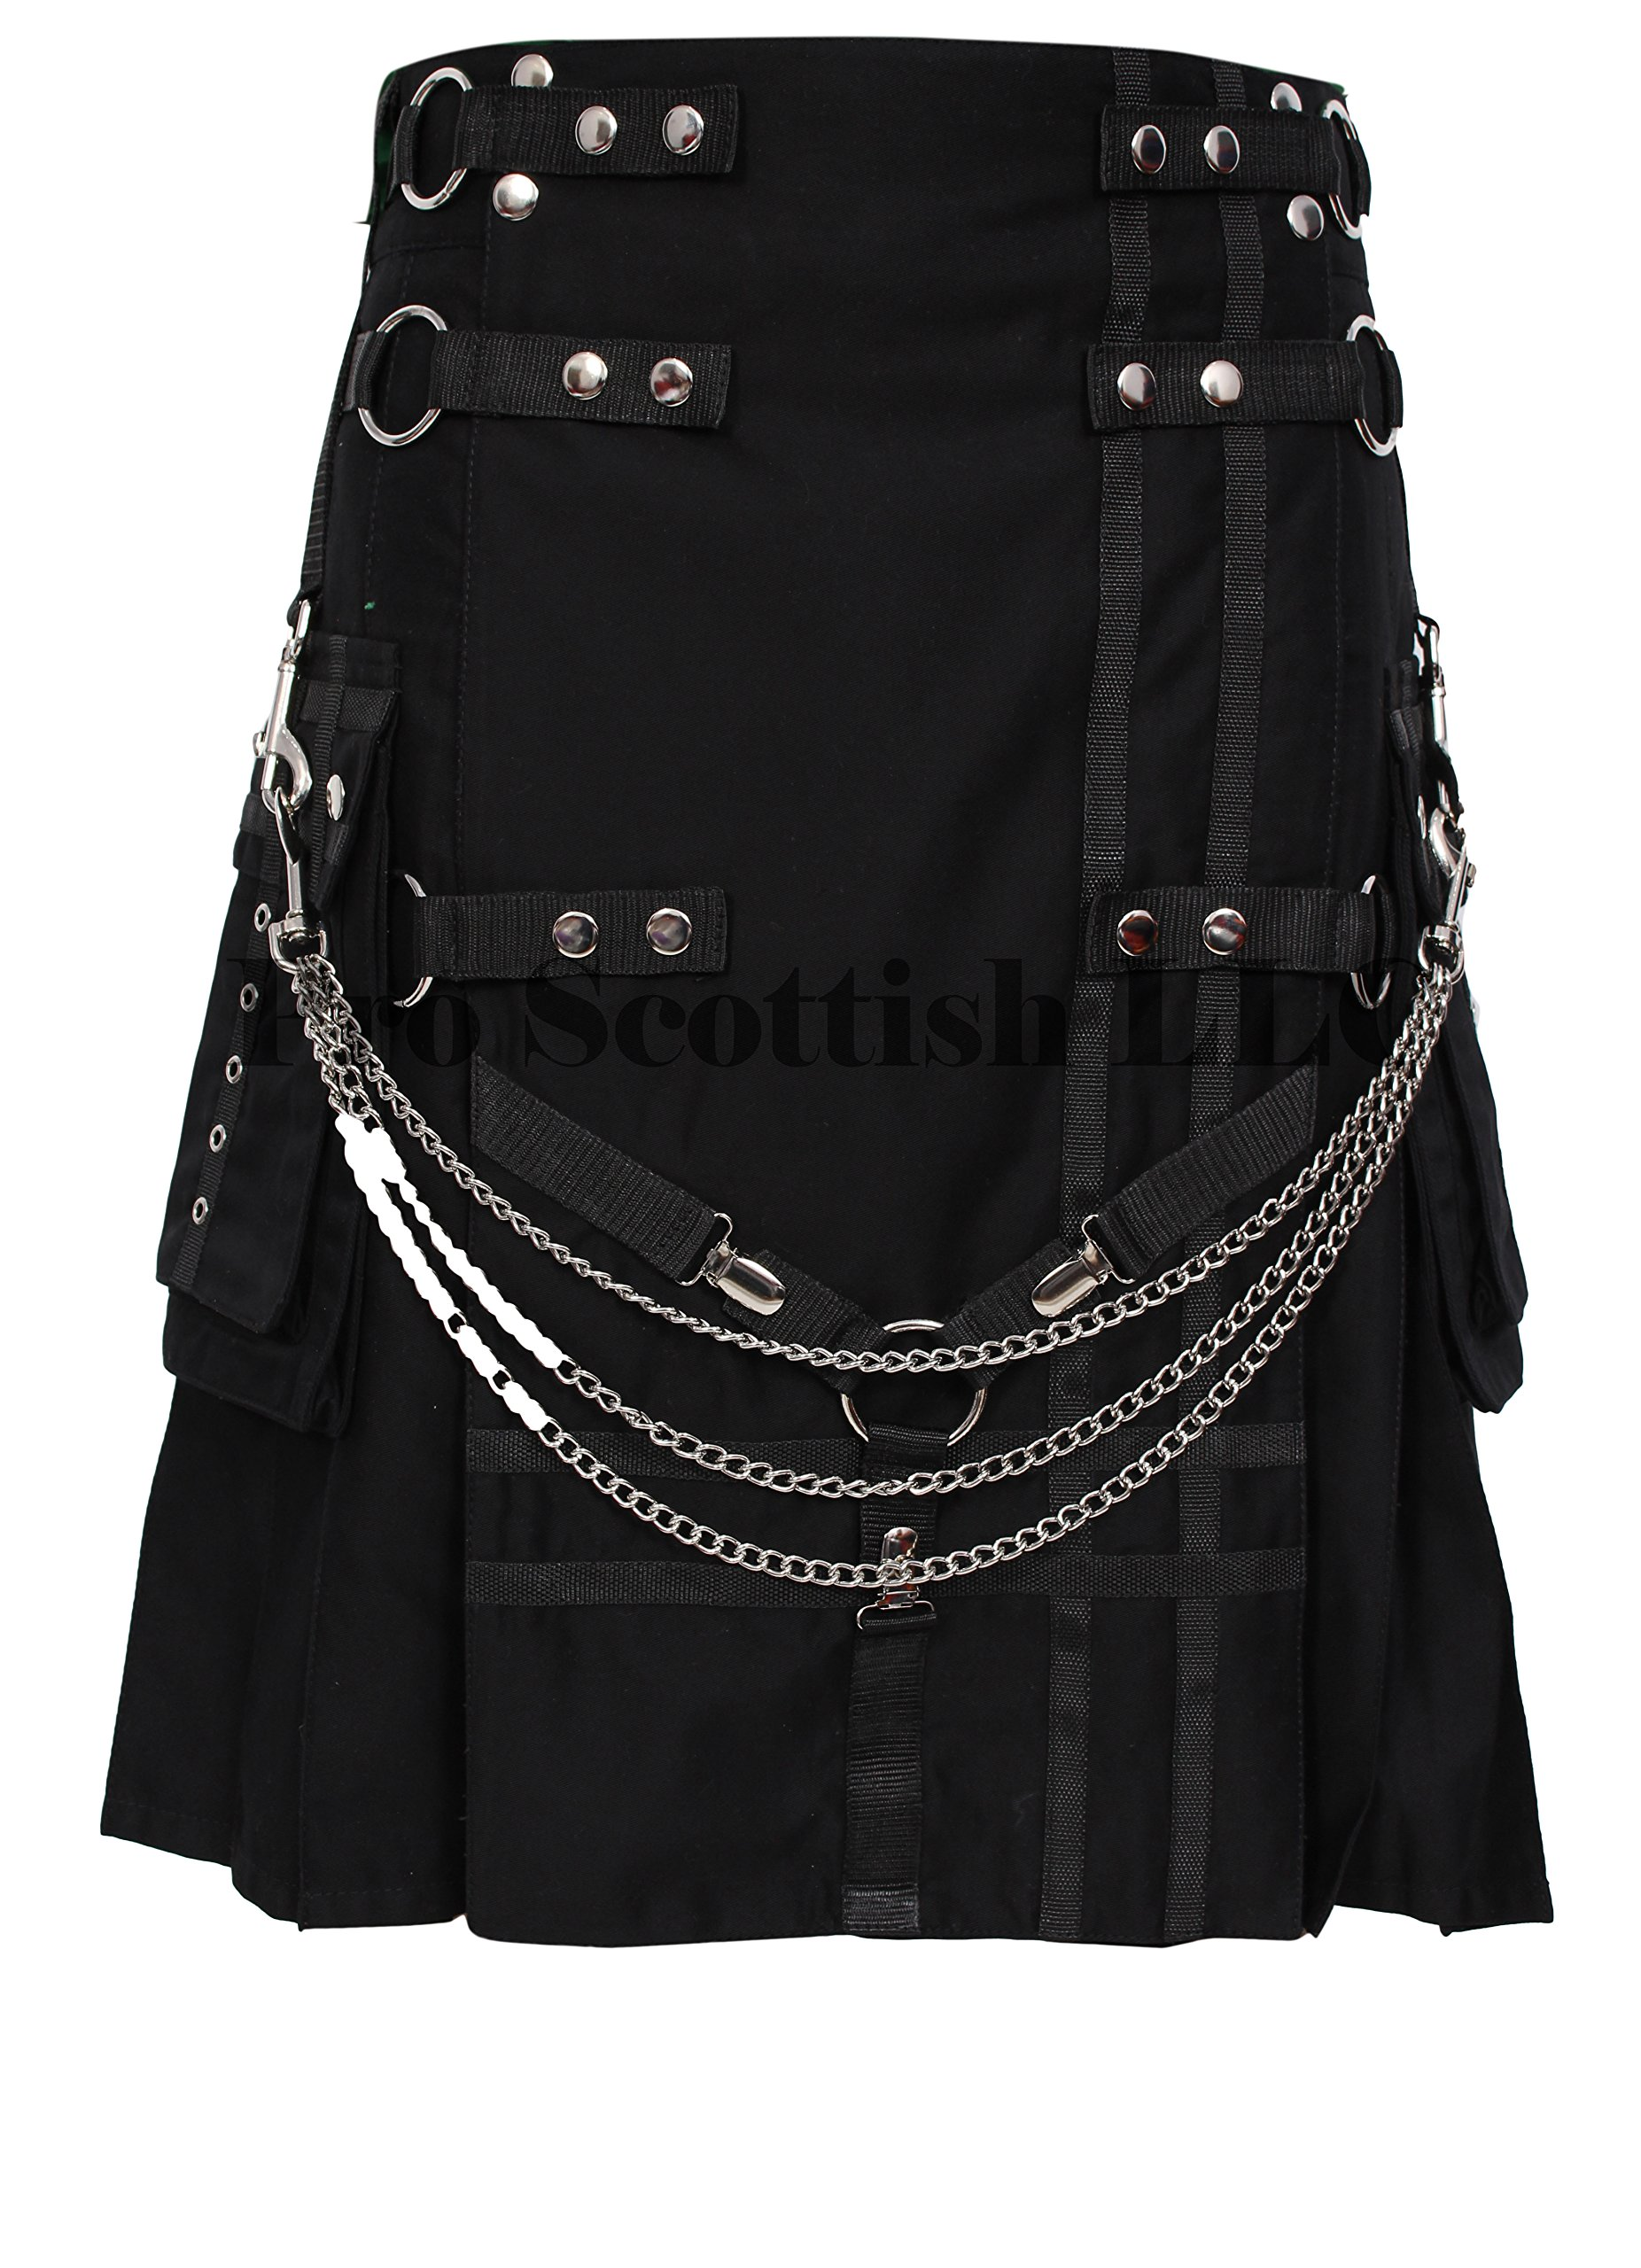 Black Deluxe Utility Fashion Kilt With Chain (32W x 24L)